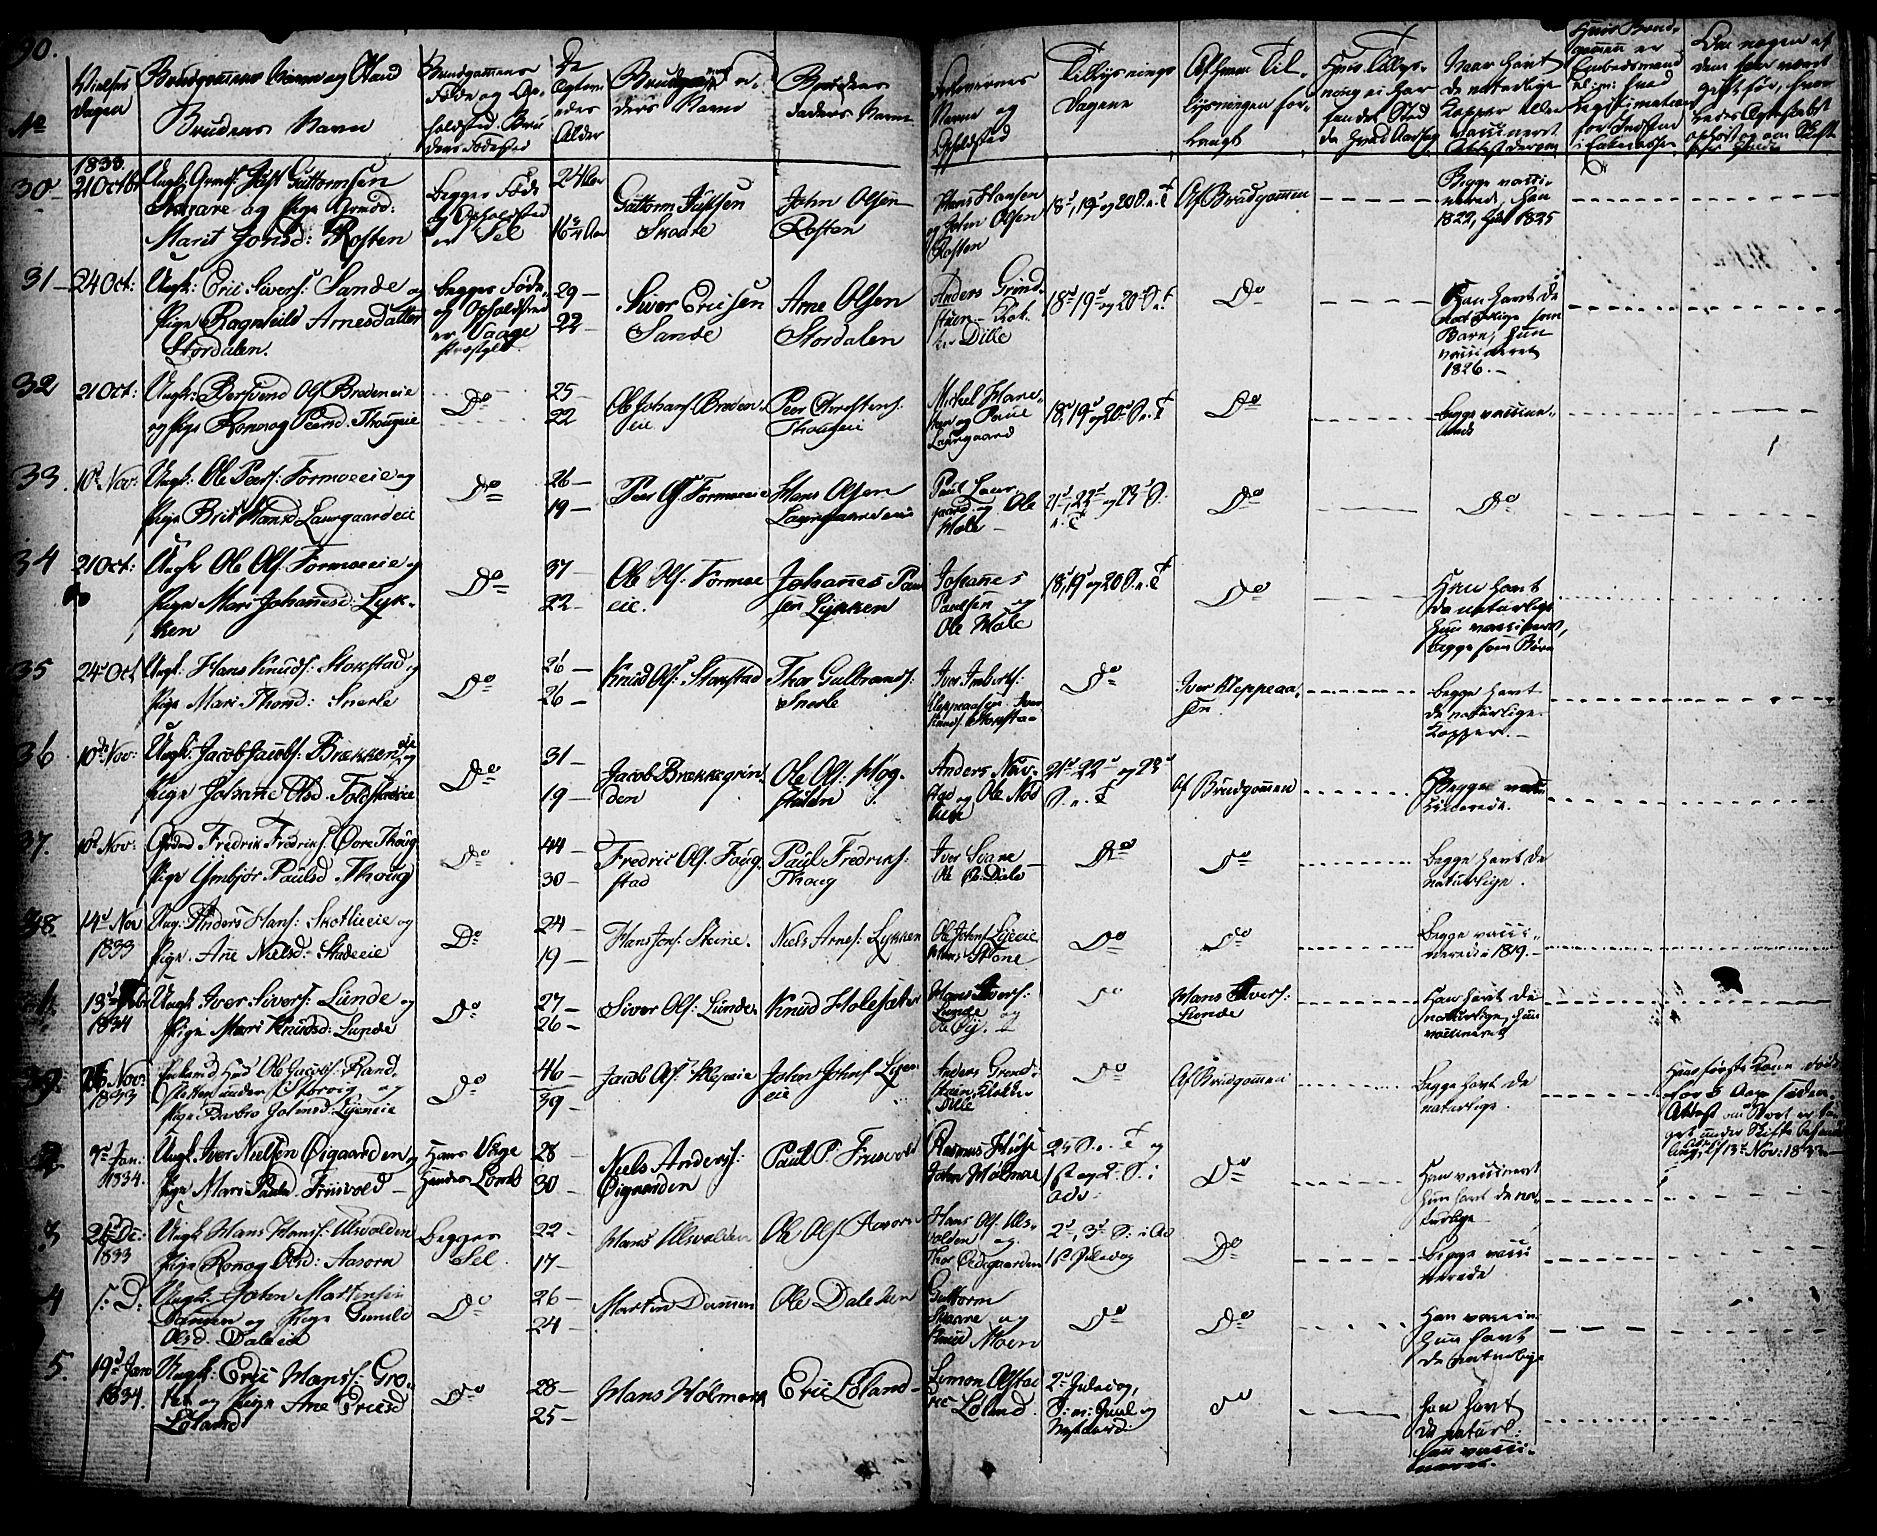 SAH, Vågå prestekontor, Ministerialbok nr. 4 /1, 1827-1842, s. 190